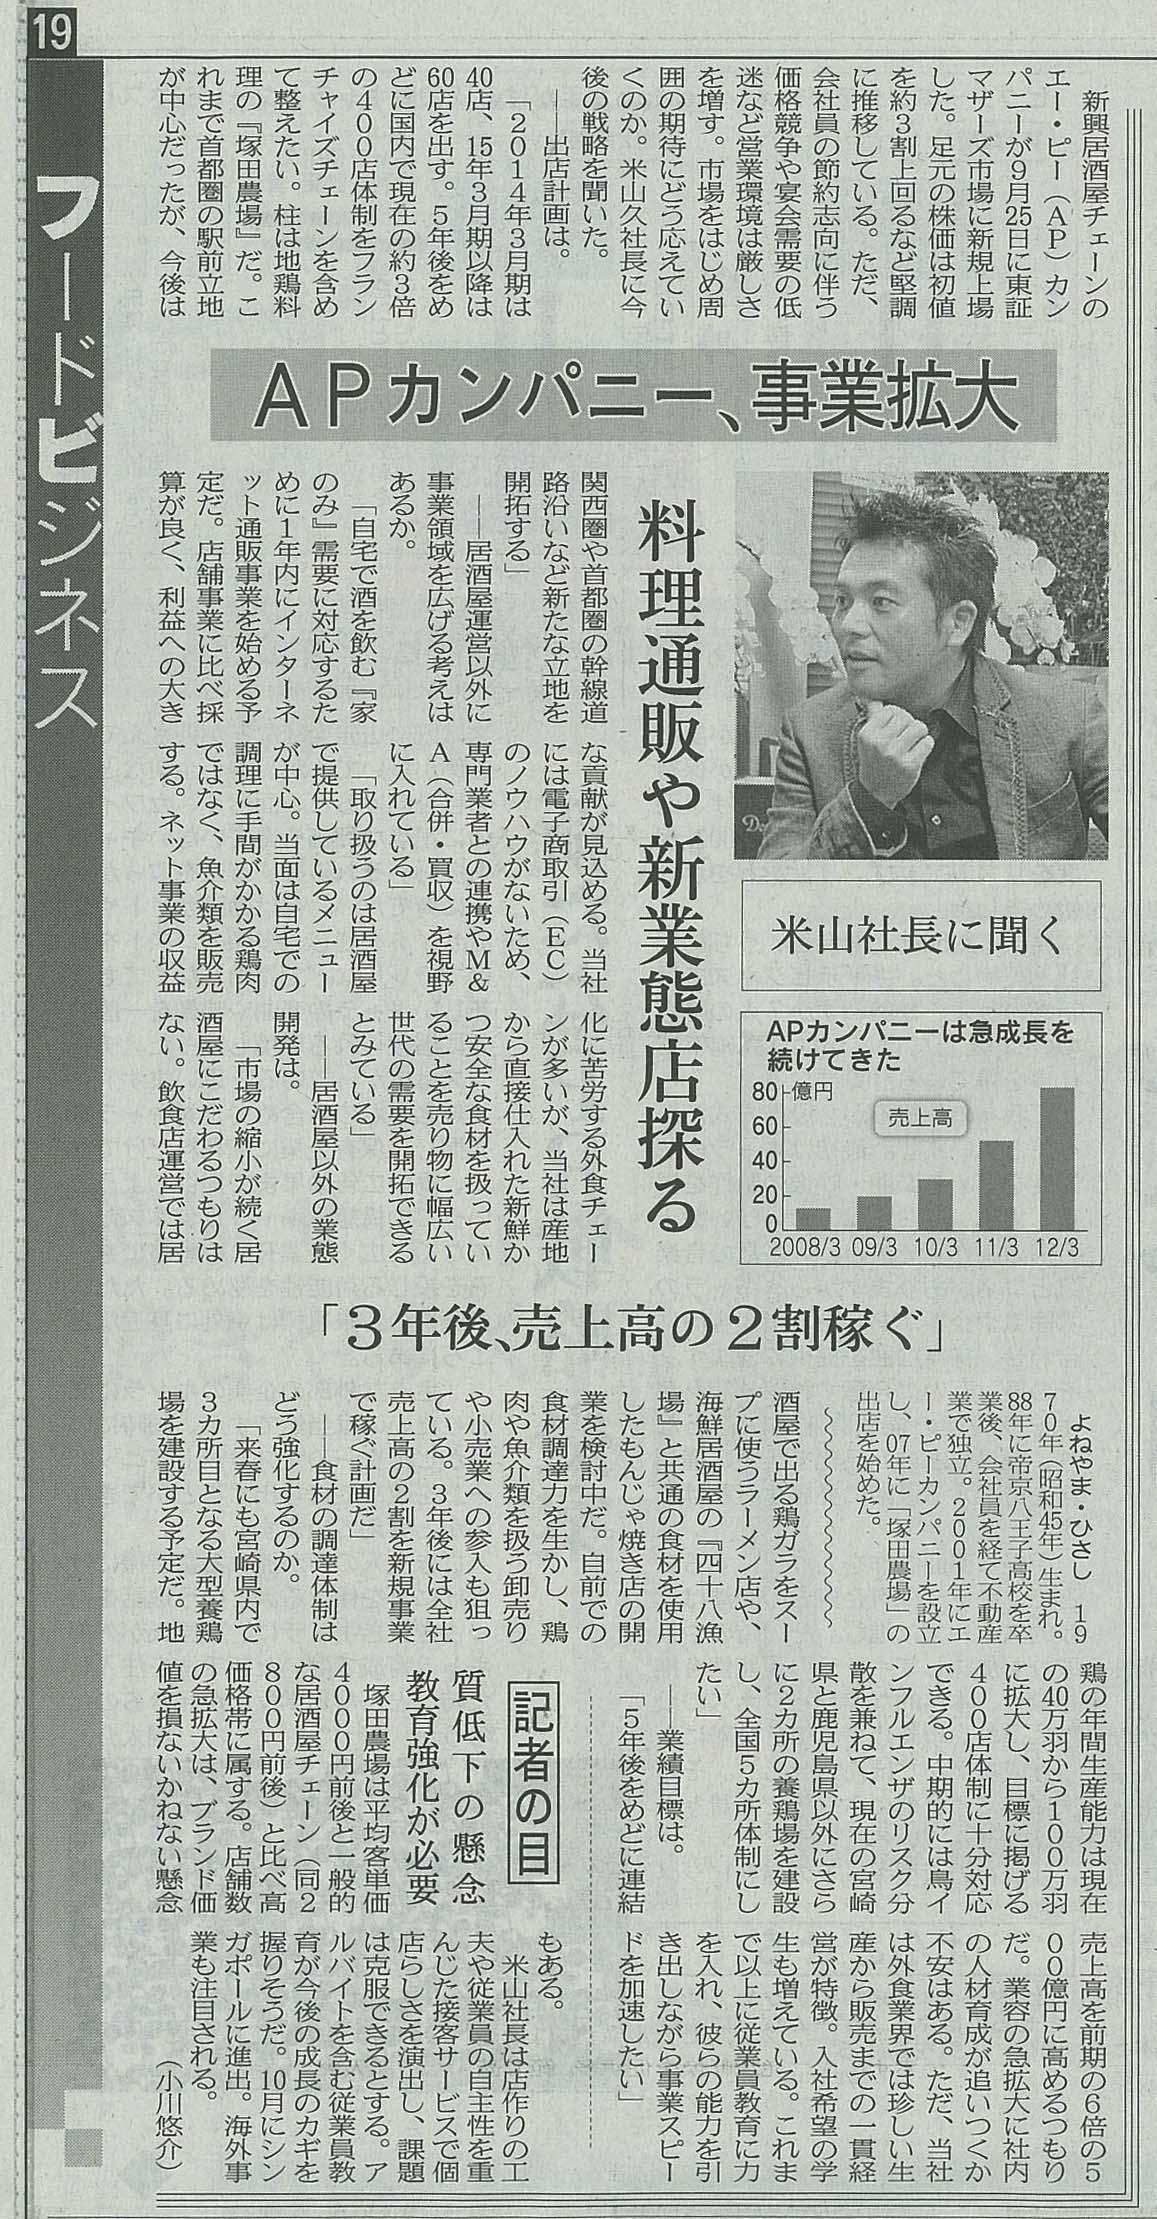 http://www.apcompany.jp/media/2012/11/03/121102%E6%97%A5%E7%B5%8C%EF%BC%AD%EF%BC%AA_%E4%BA%8B%E6%A5%AD%E6%8B%A1%E5%A4%A7.jpg